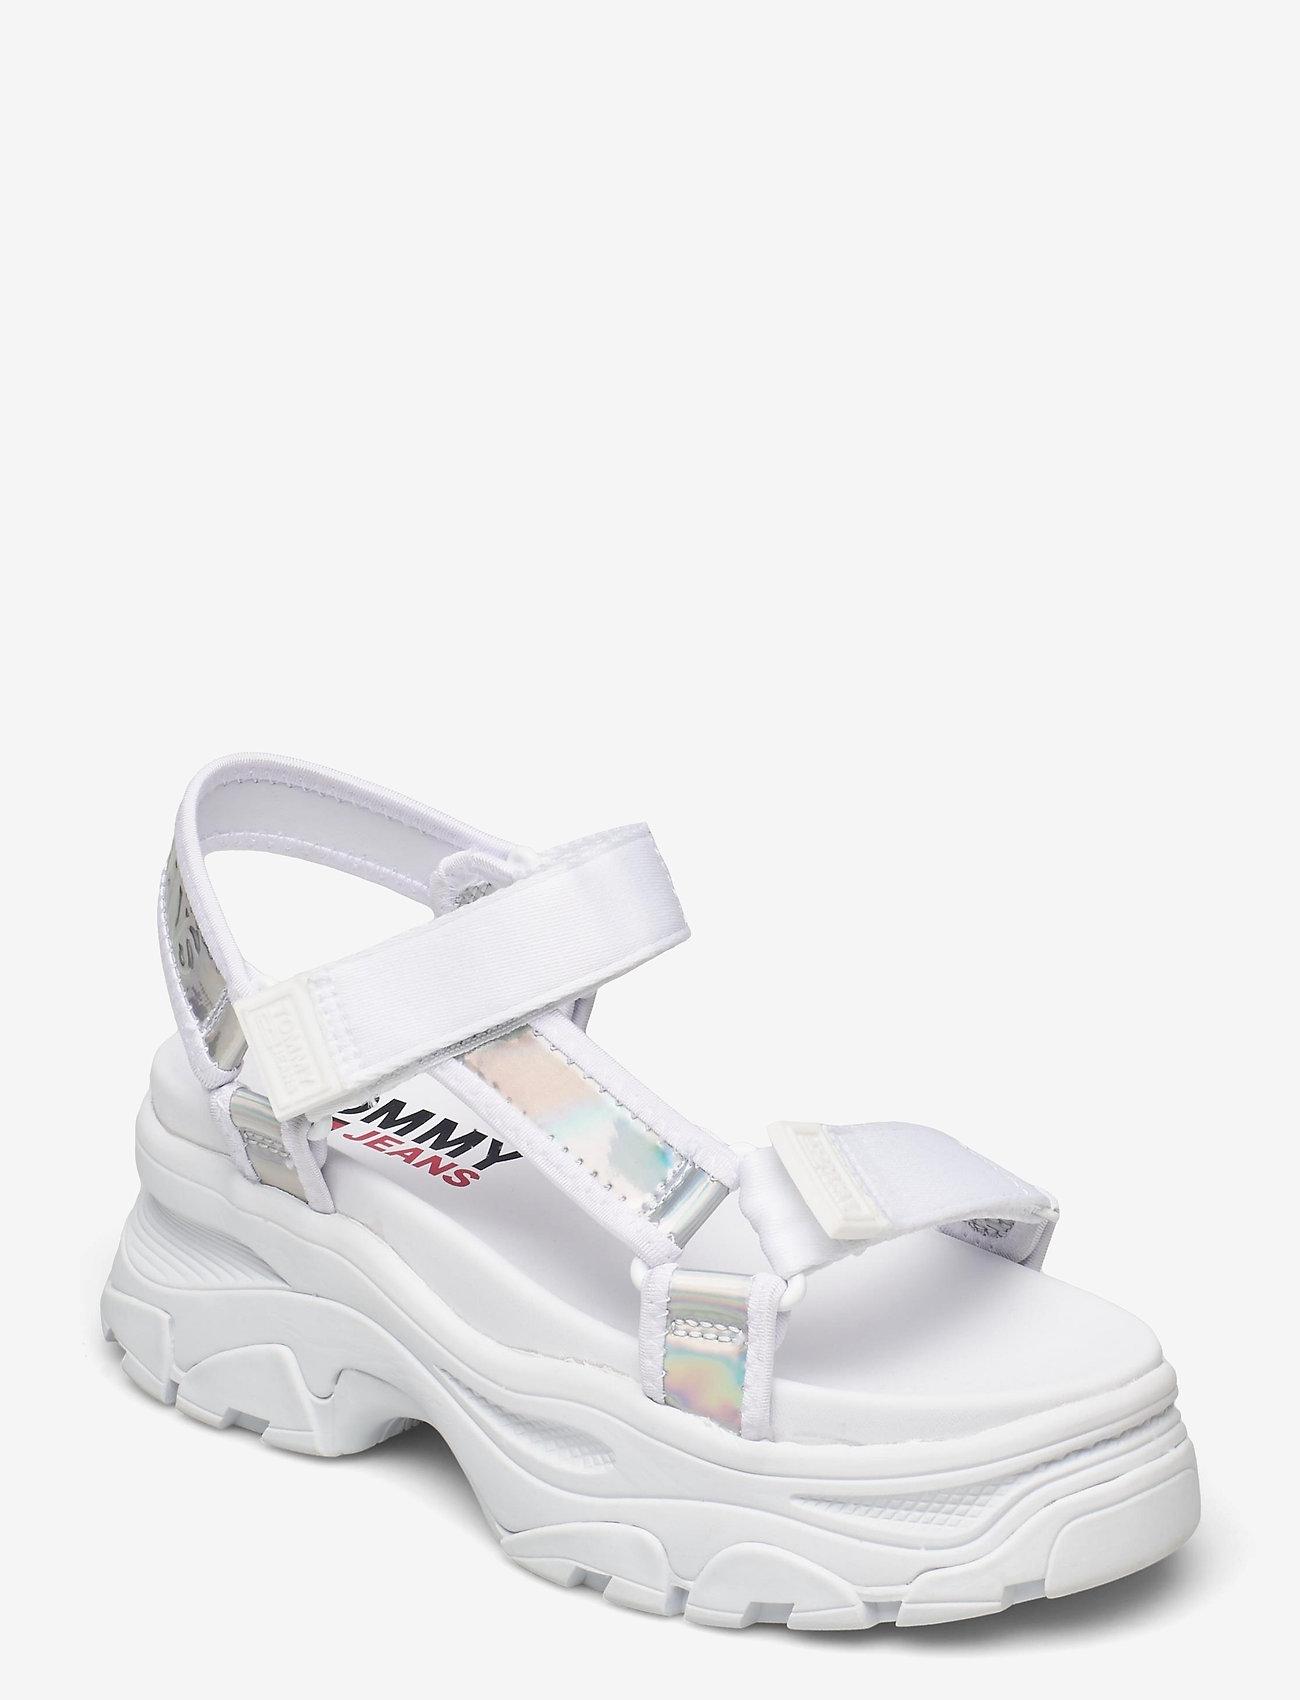 Tommy Hilfiger - IRIDESCENT HYBRID SANDAL - flat sandals - white - 0